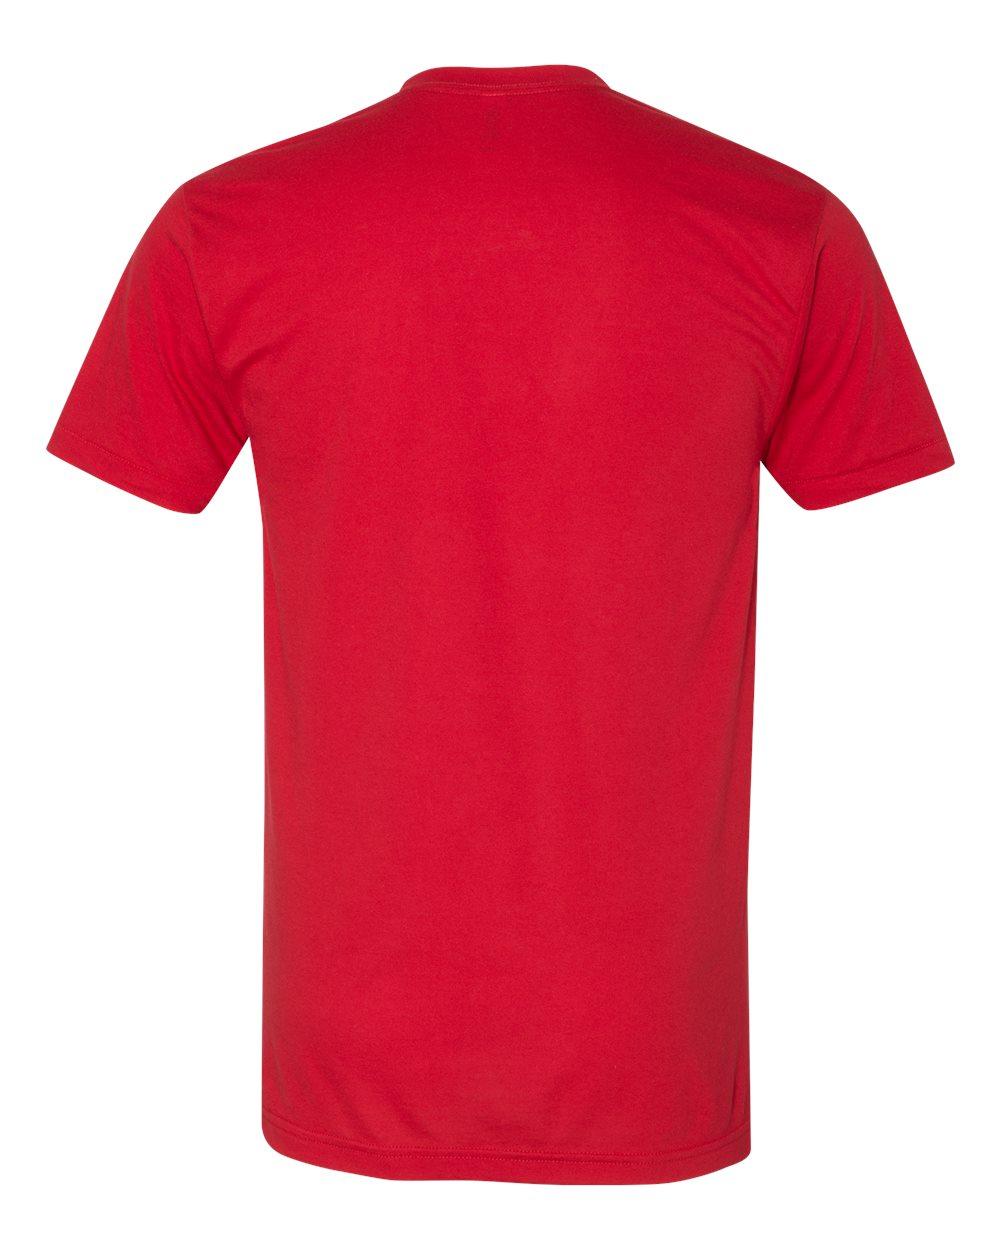 American-Apparel-Mens-Slim-Fit-50-50-Cotton-T-Shirt-Tee-BB401W-up-to-2XL thumbnail 49